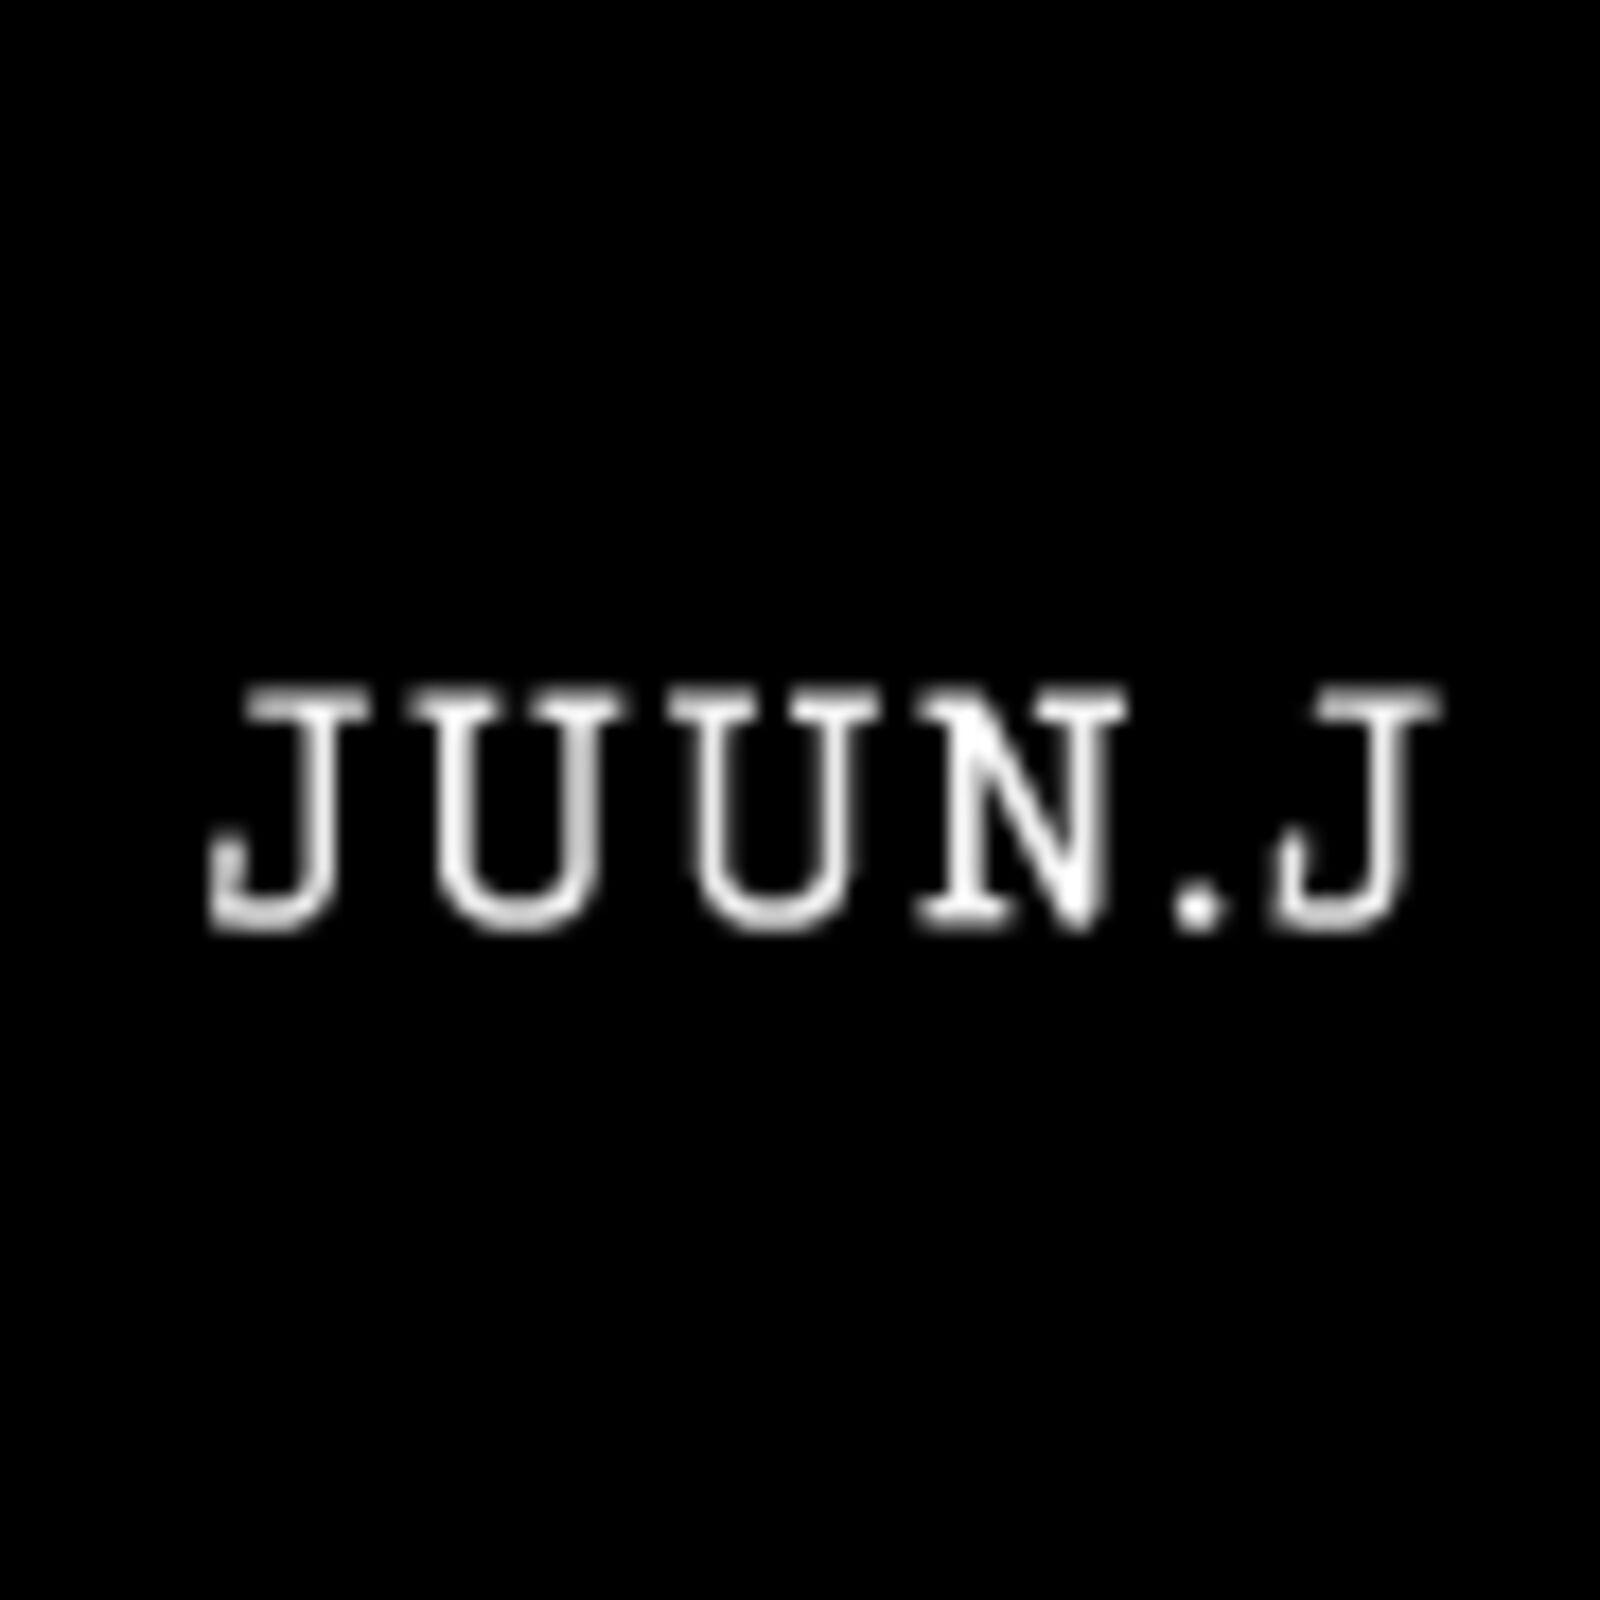 Juun.J (Bild 1)